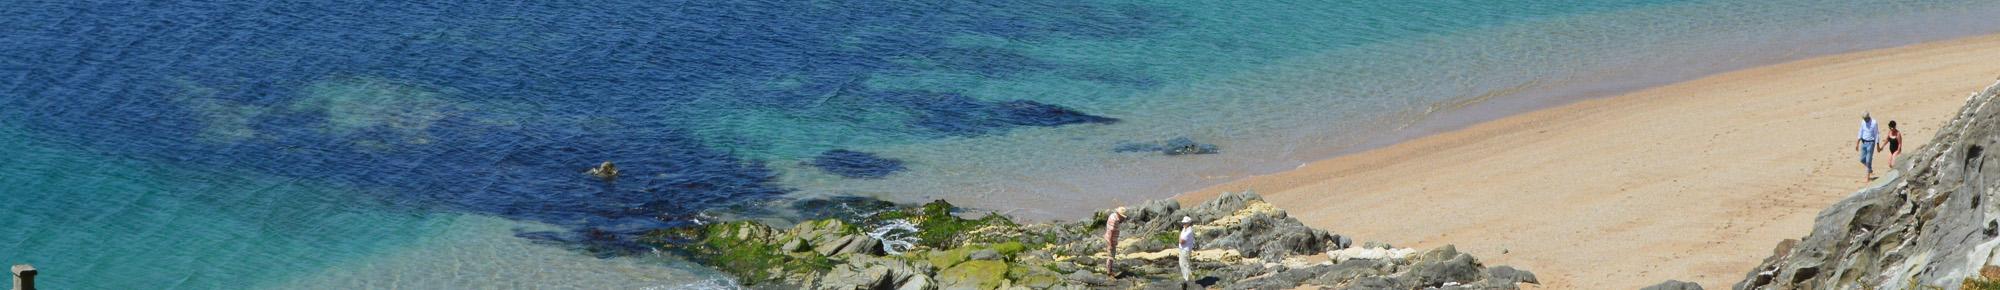 Porthleven-Beach